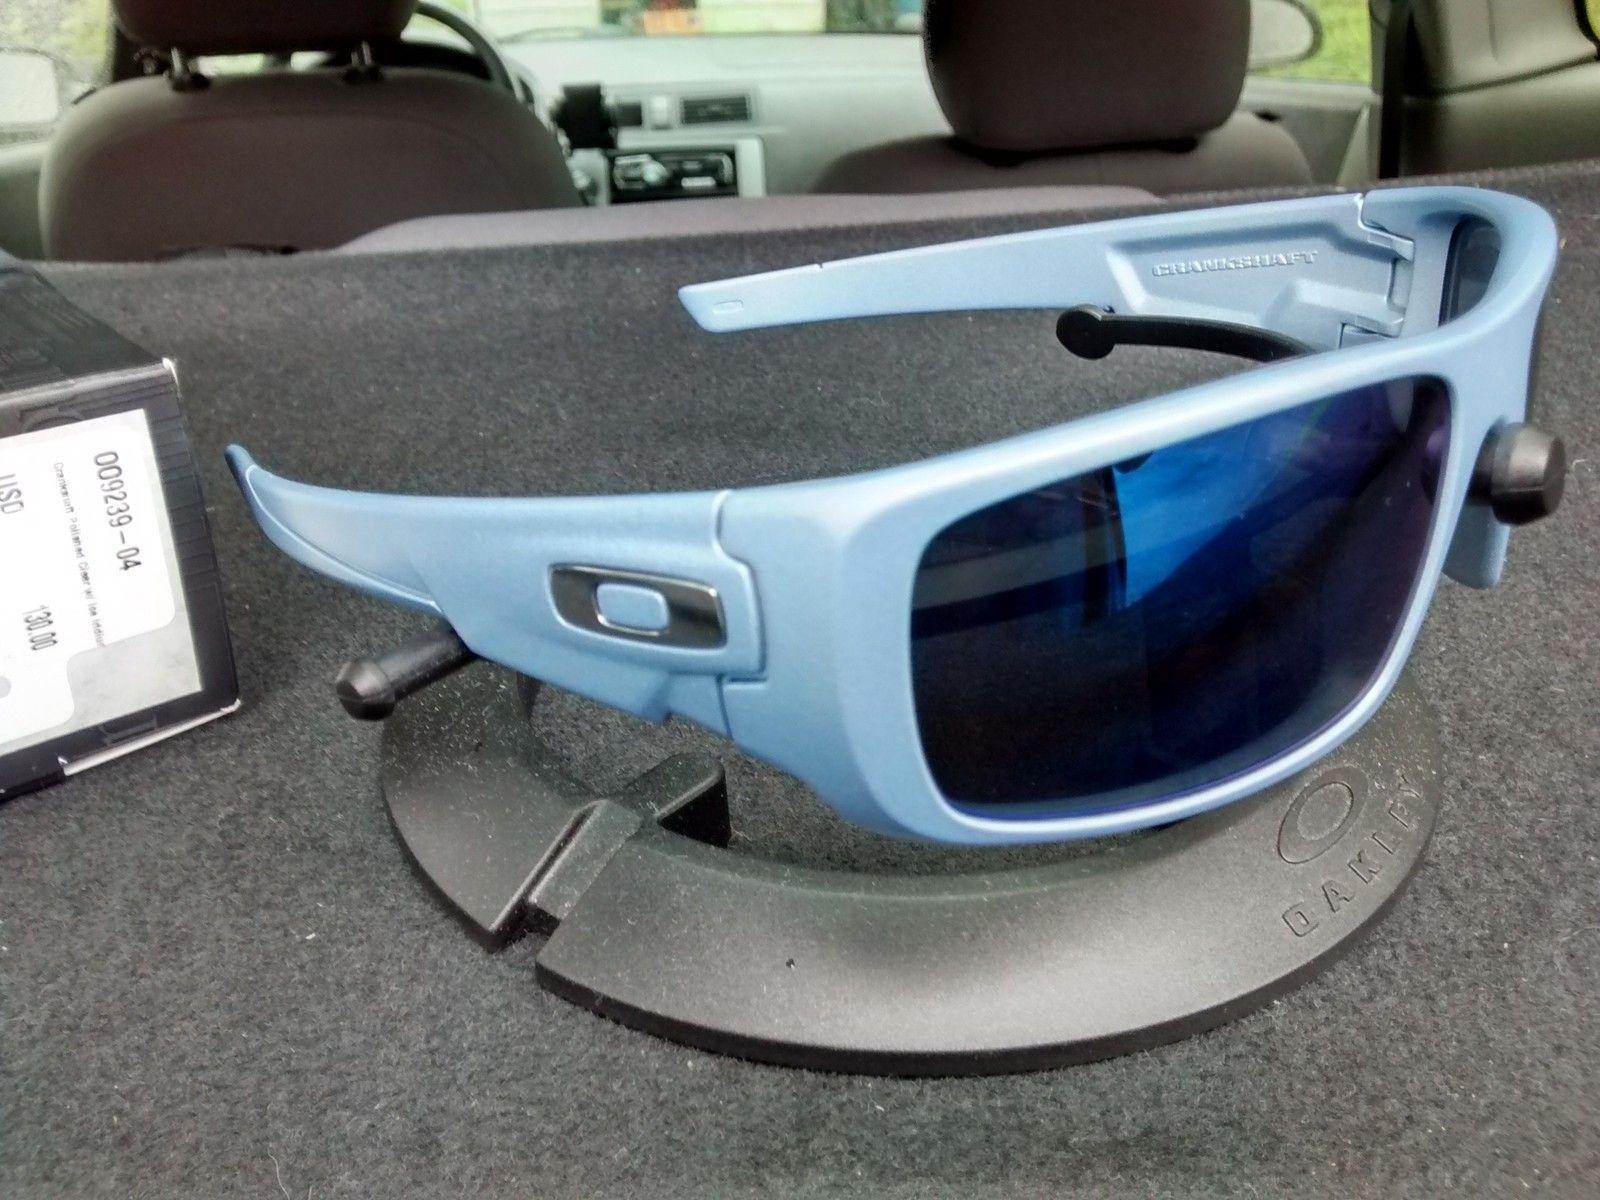 Cool As Ice! Custom Light Blue Metalic Cerakote Crankshaft - GWpRpF4.jpg